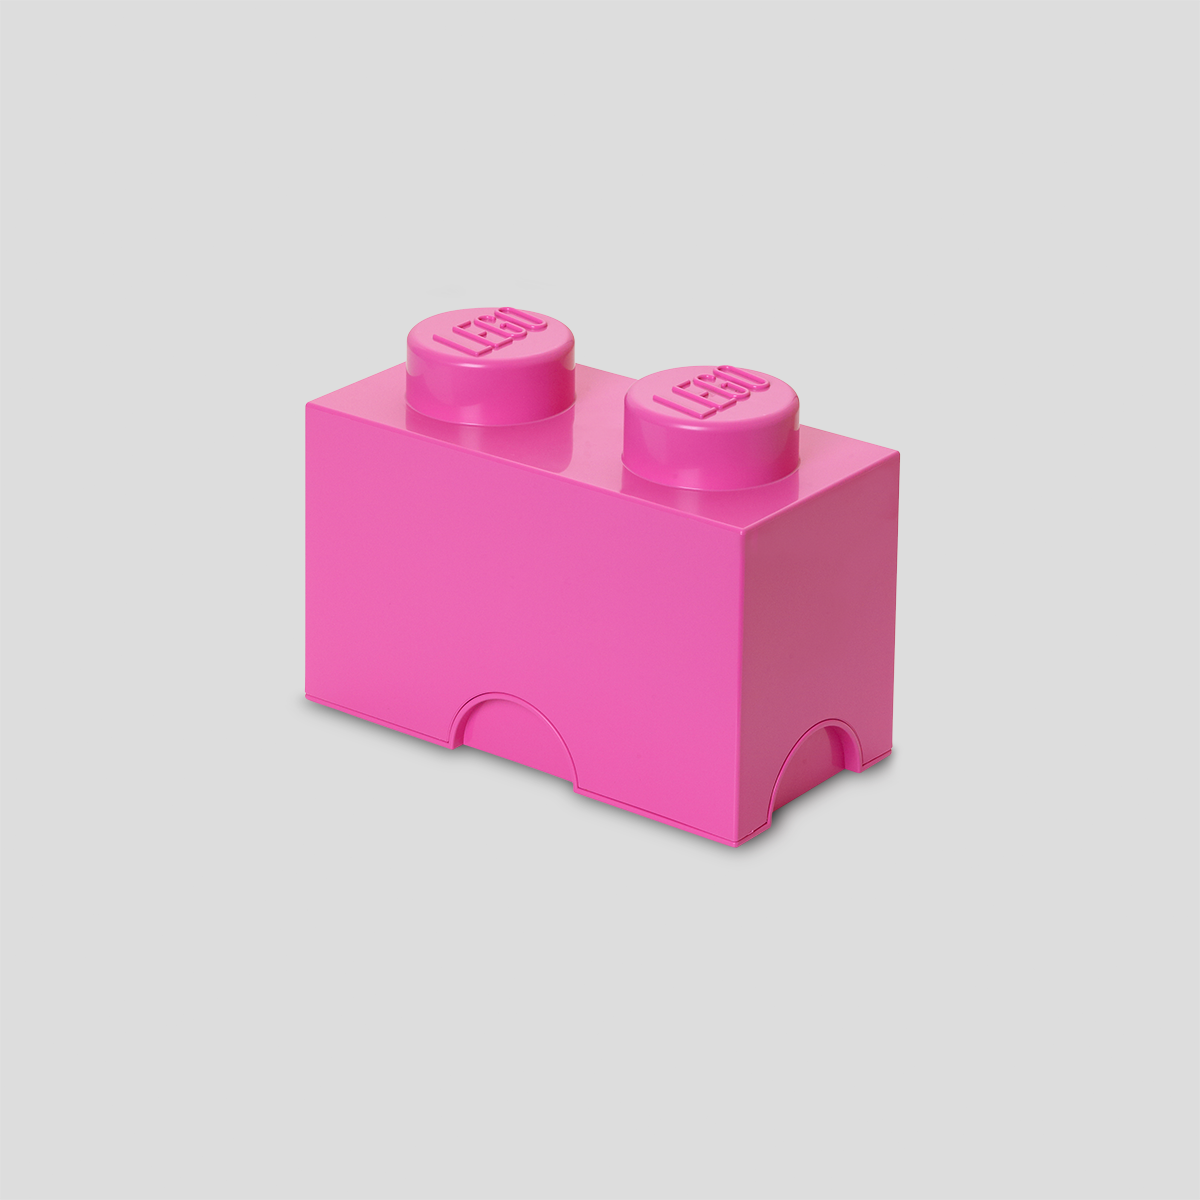 LEGO # 4002 STORAGE BRICK 2 KNOB - BRIGHT PURPLE